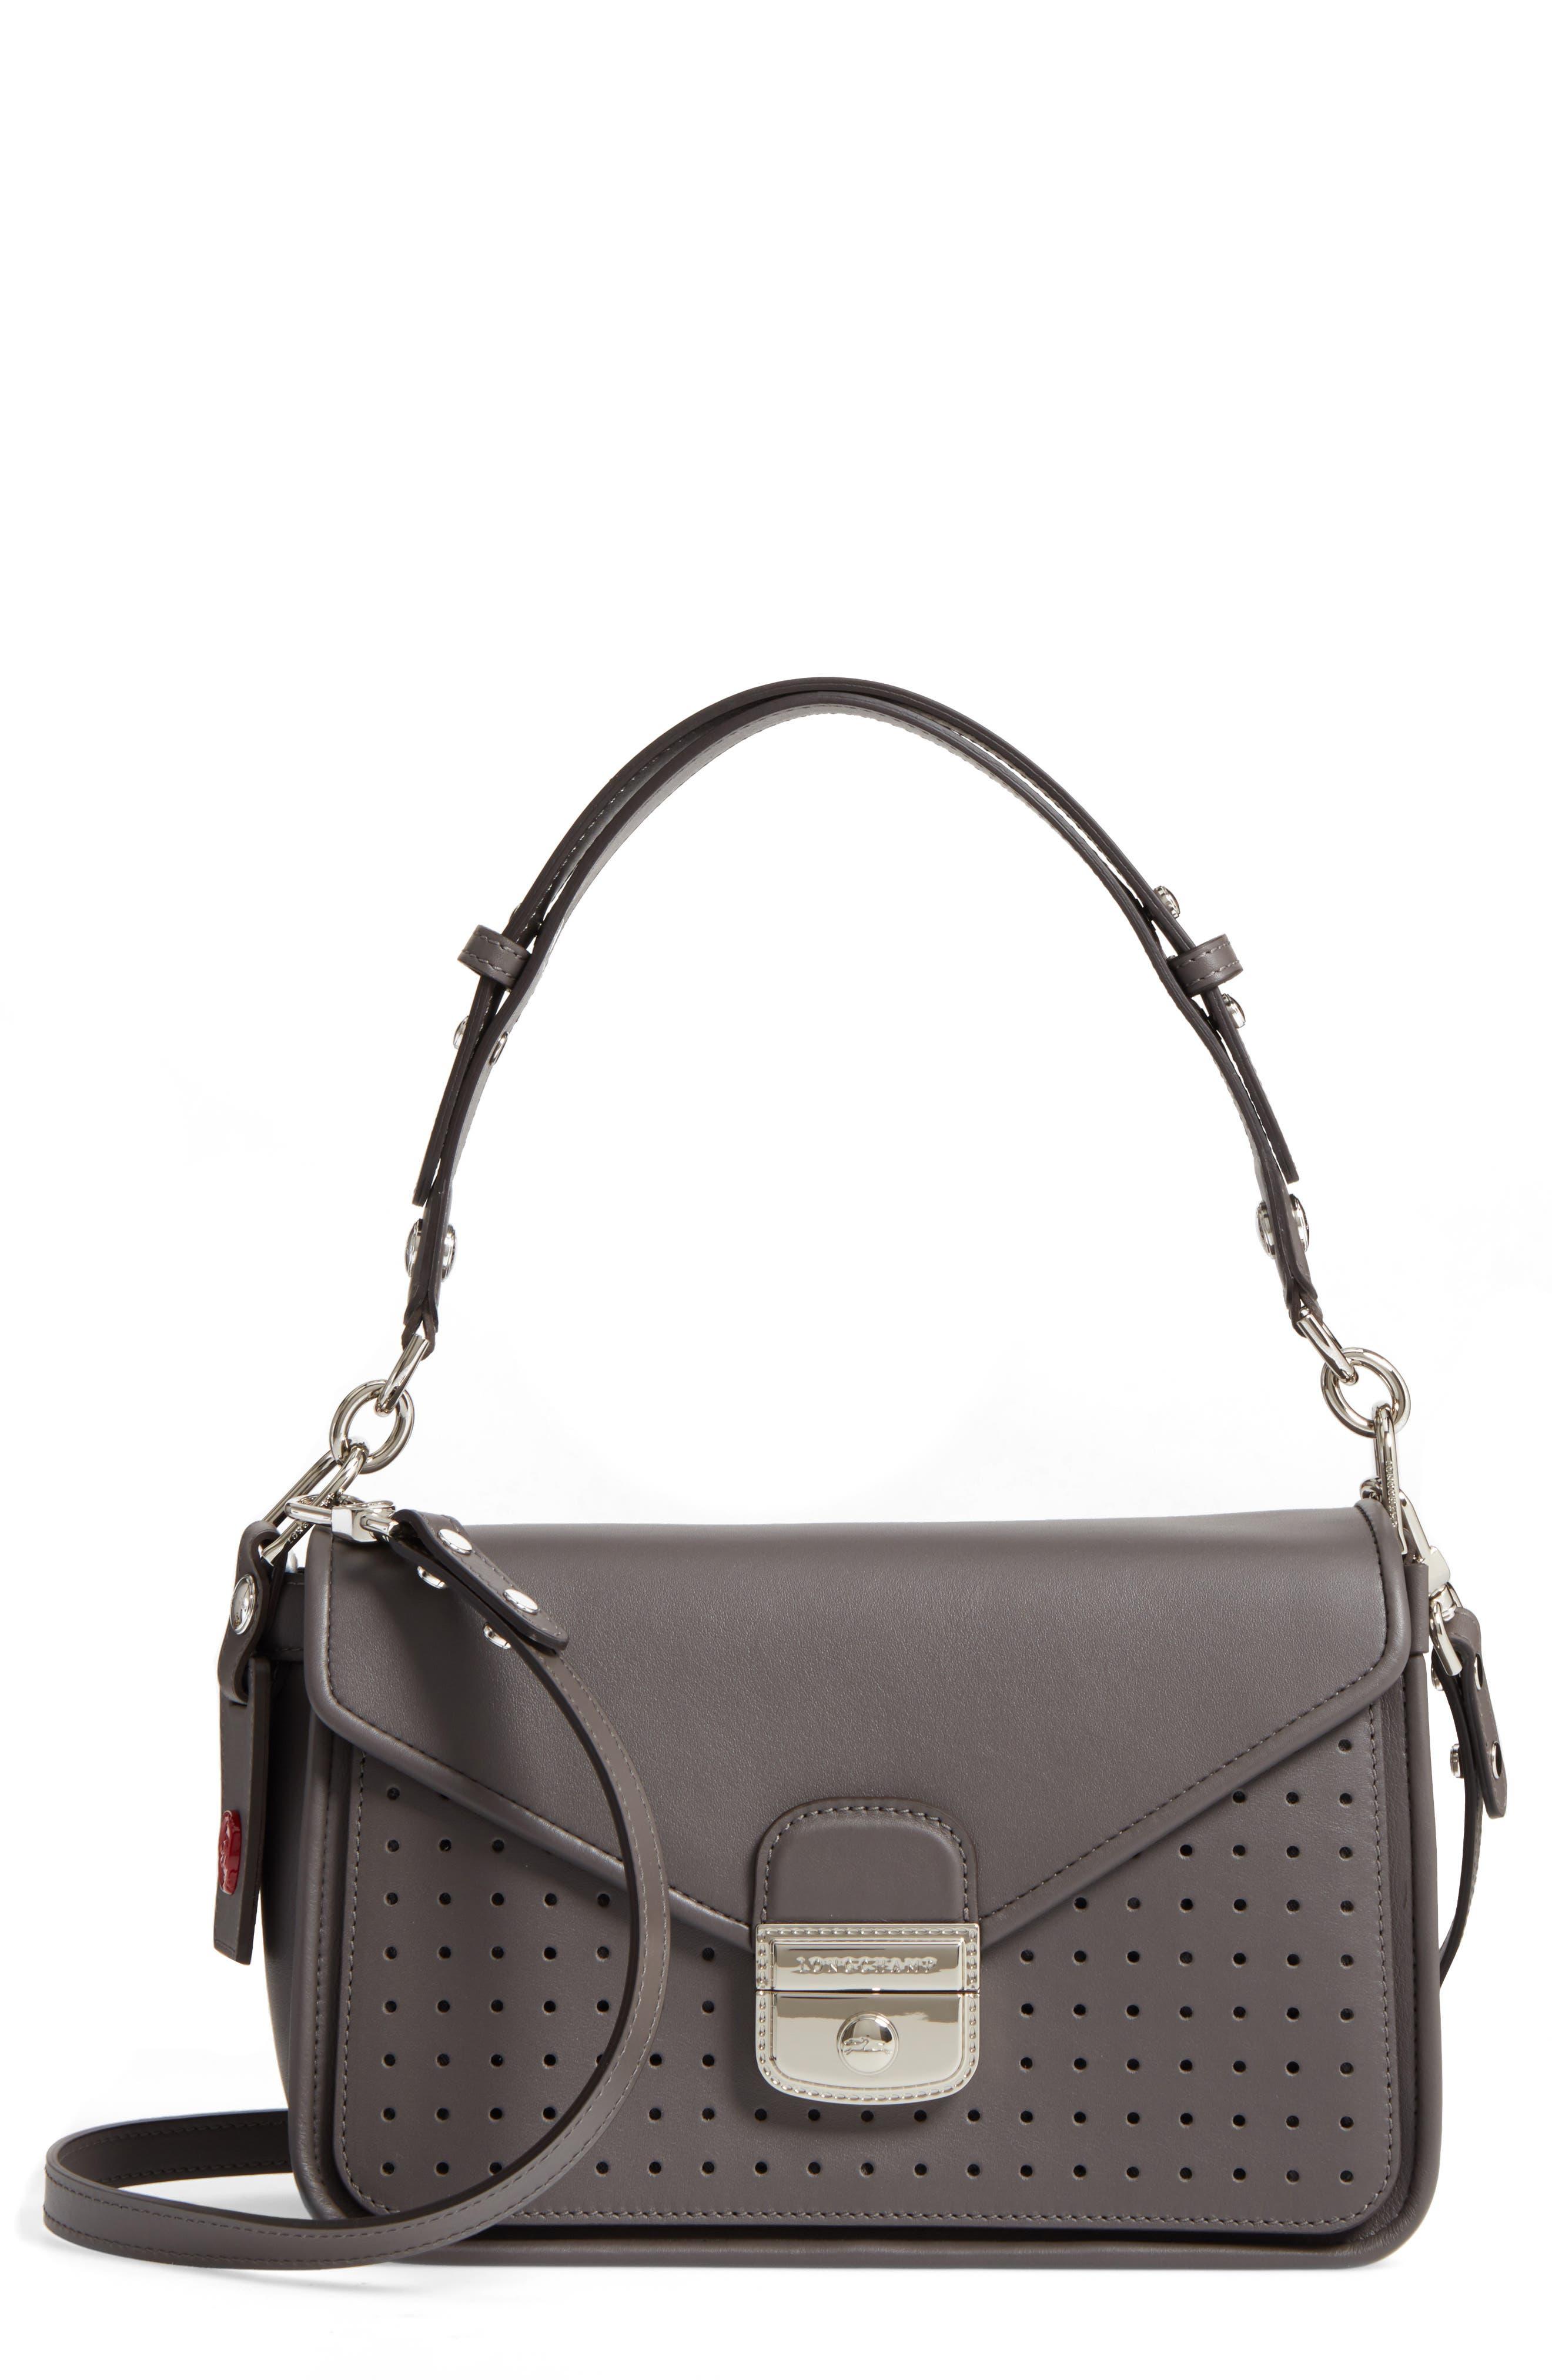 Main Image - Longchamp Mademoiselle Calfskin Leather Crossbody Bag